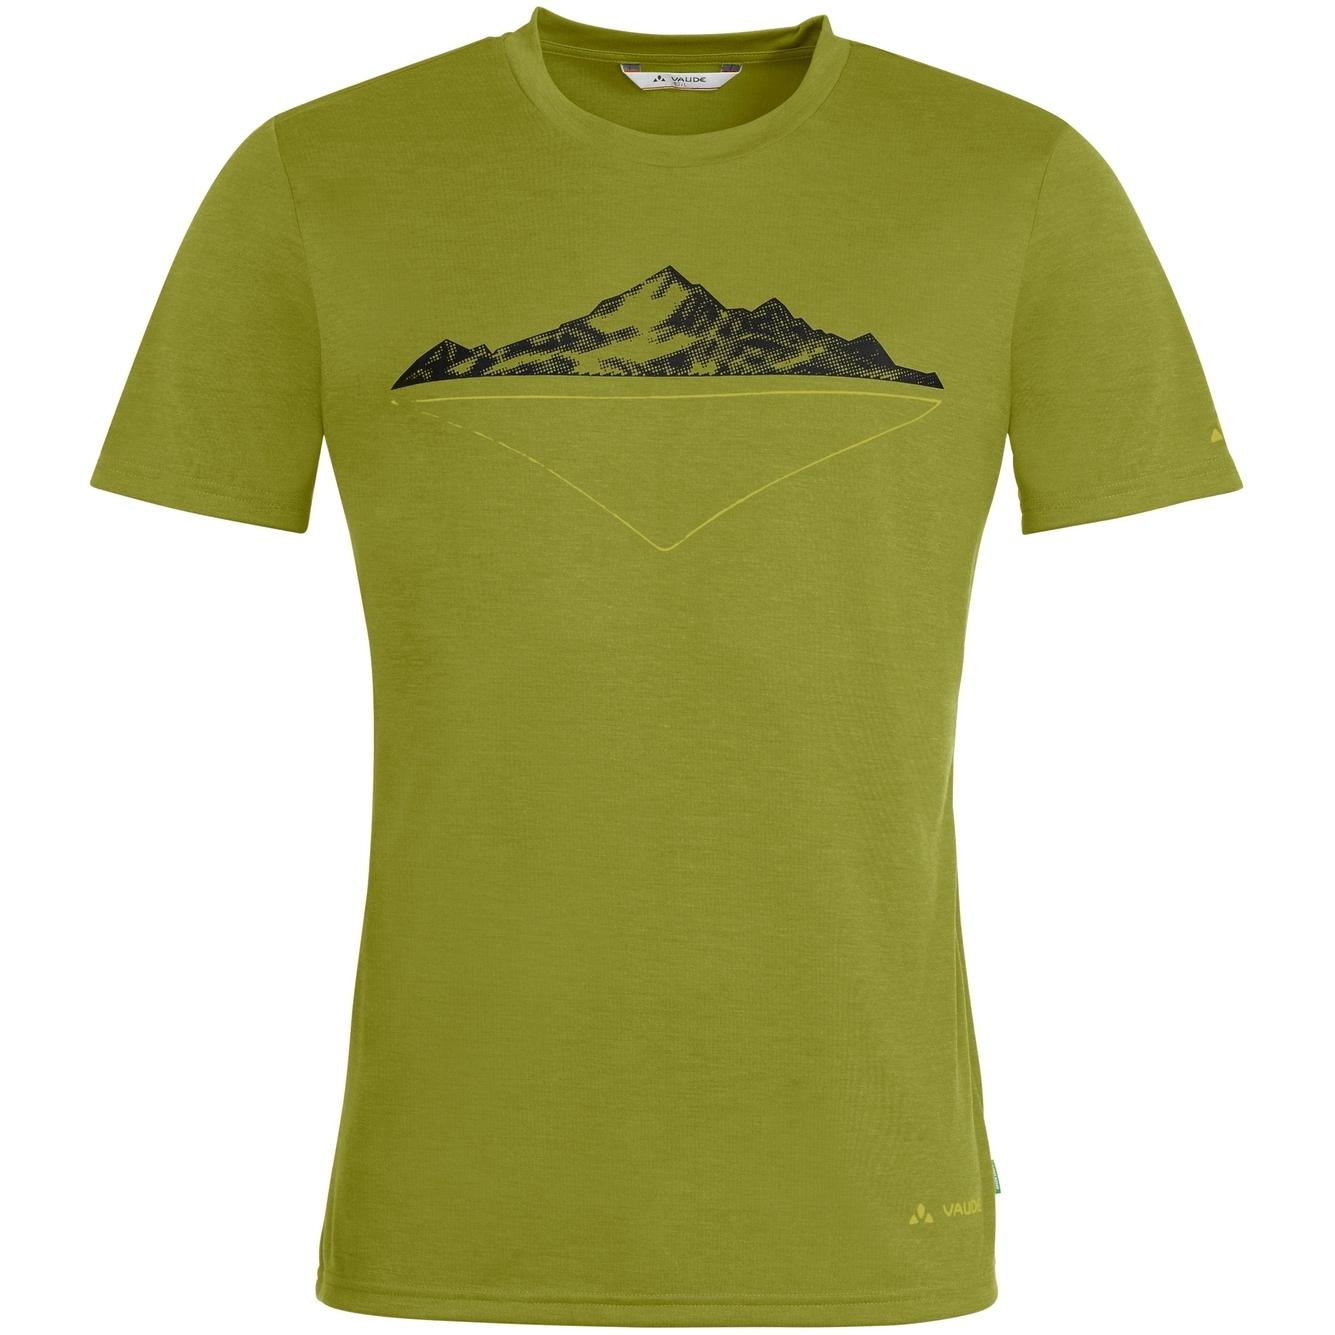 Vaude Tekoa Shirt II - avocado